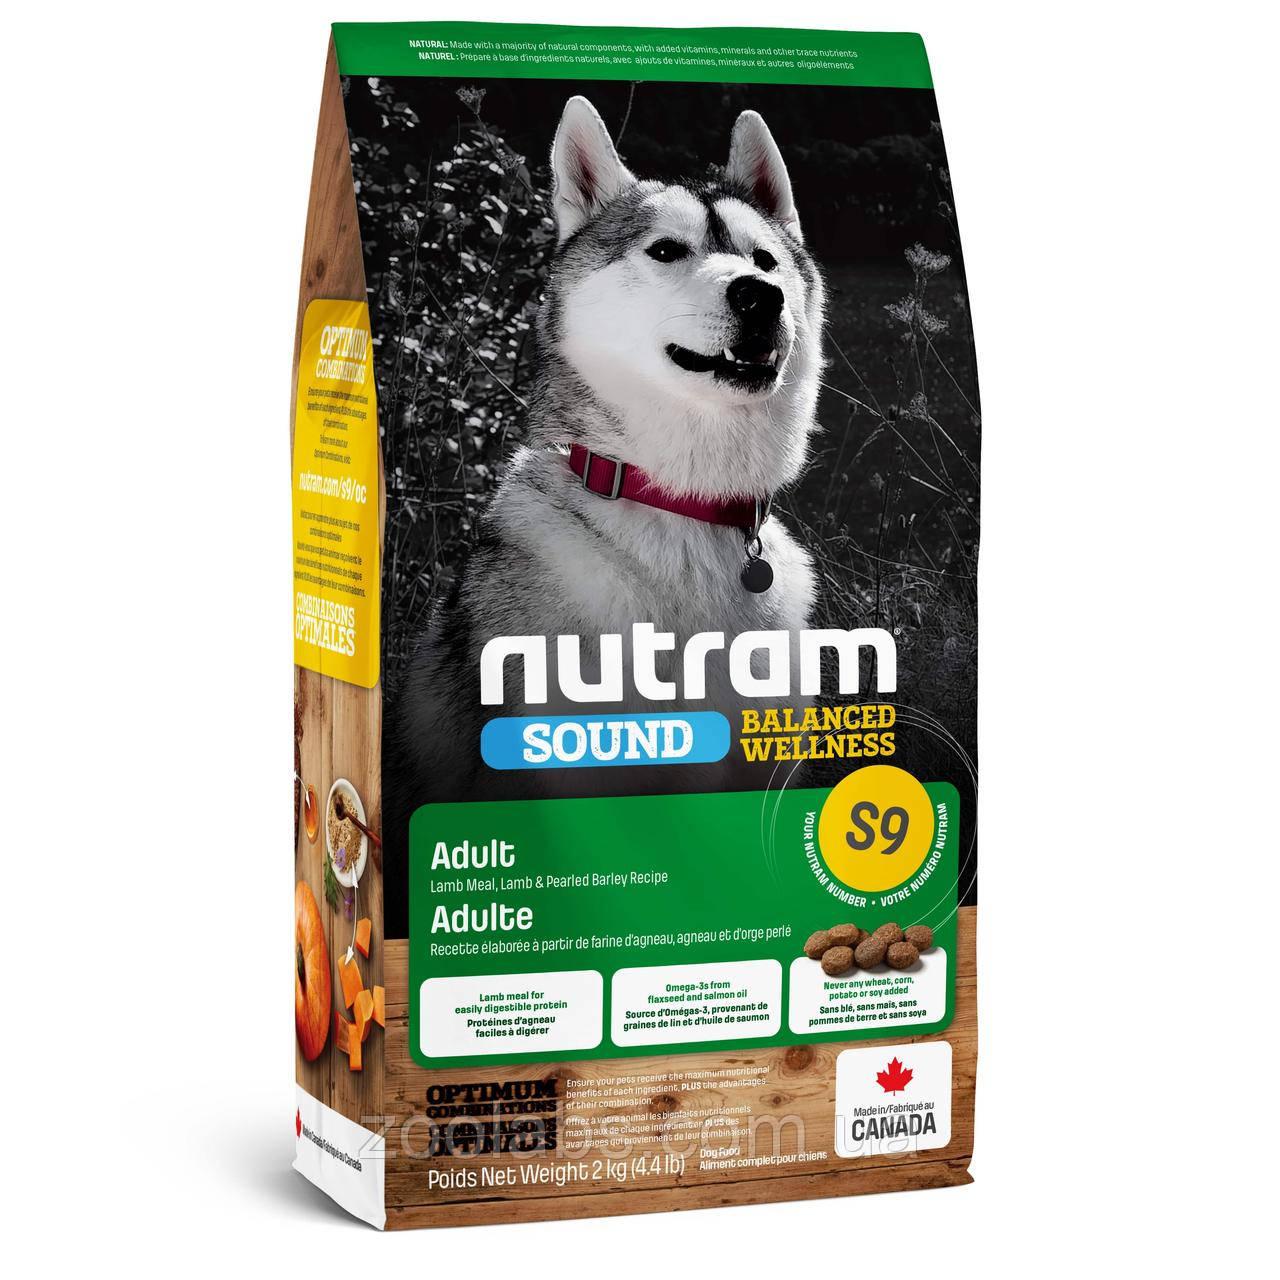 Корм Nutram для собак с ягненком | Nutram S9 Sound Balanced Wellness Natural Lamb Adult Dog 2 кг